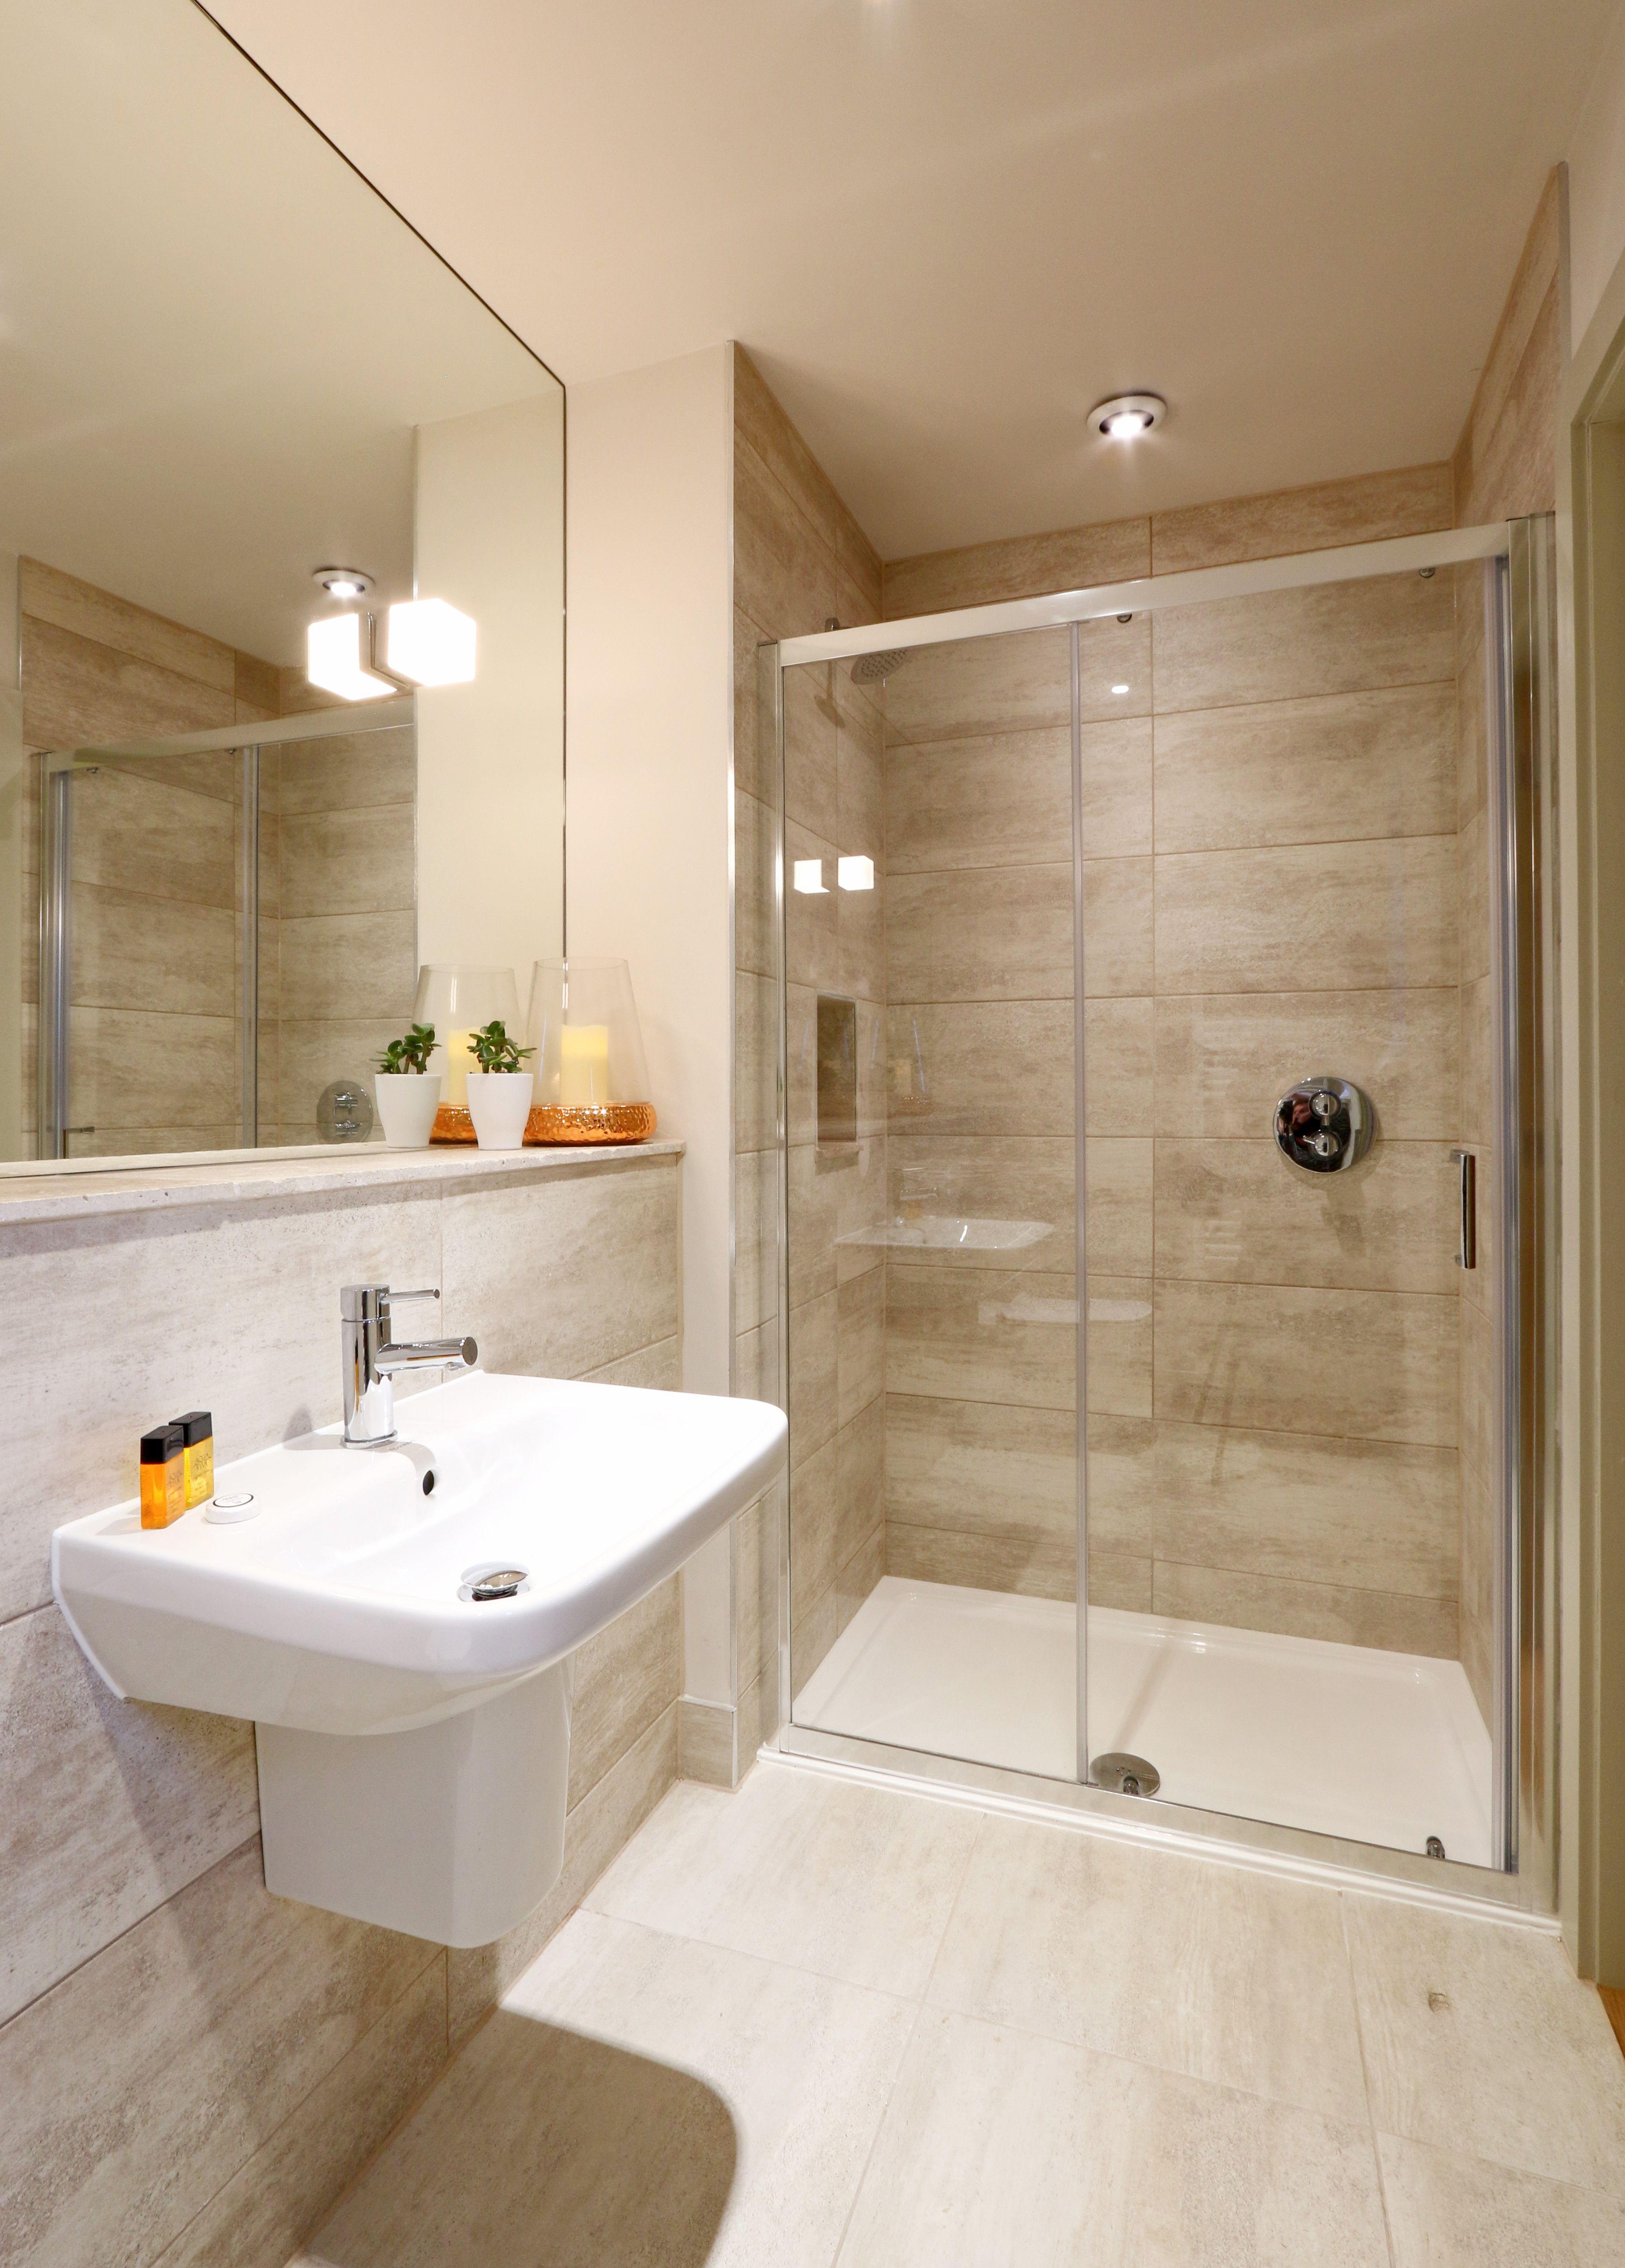 Best Luxury En Suite Shower Room At Yew Tree House In North 640 x 480